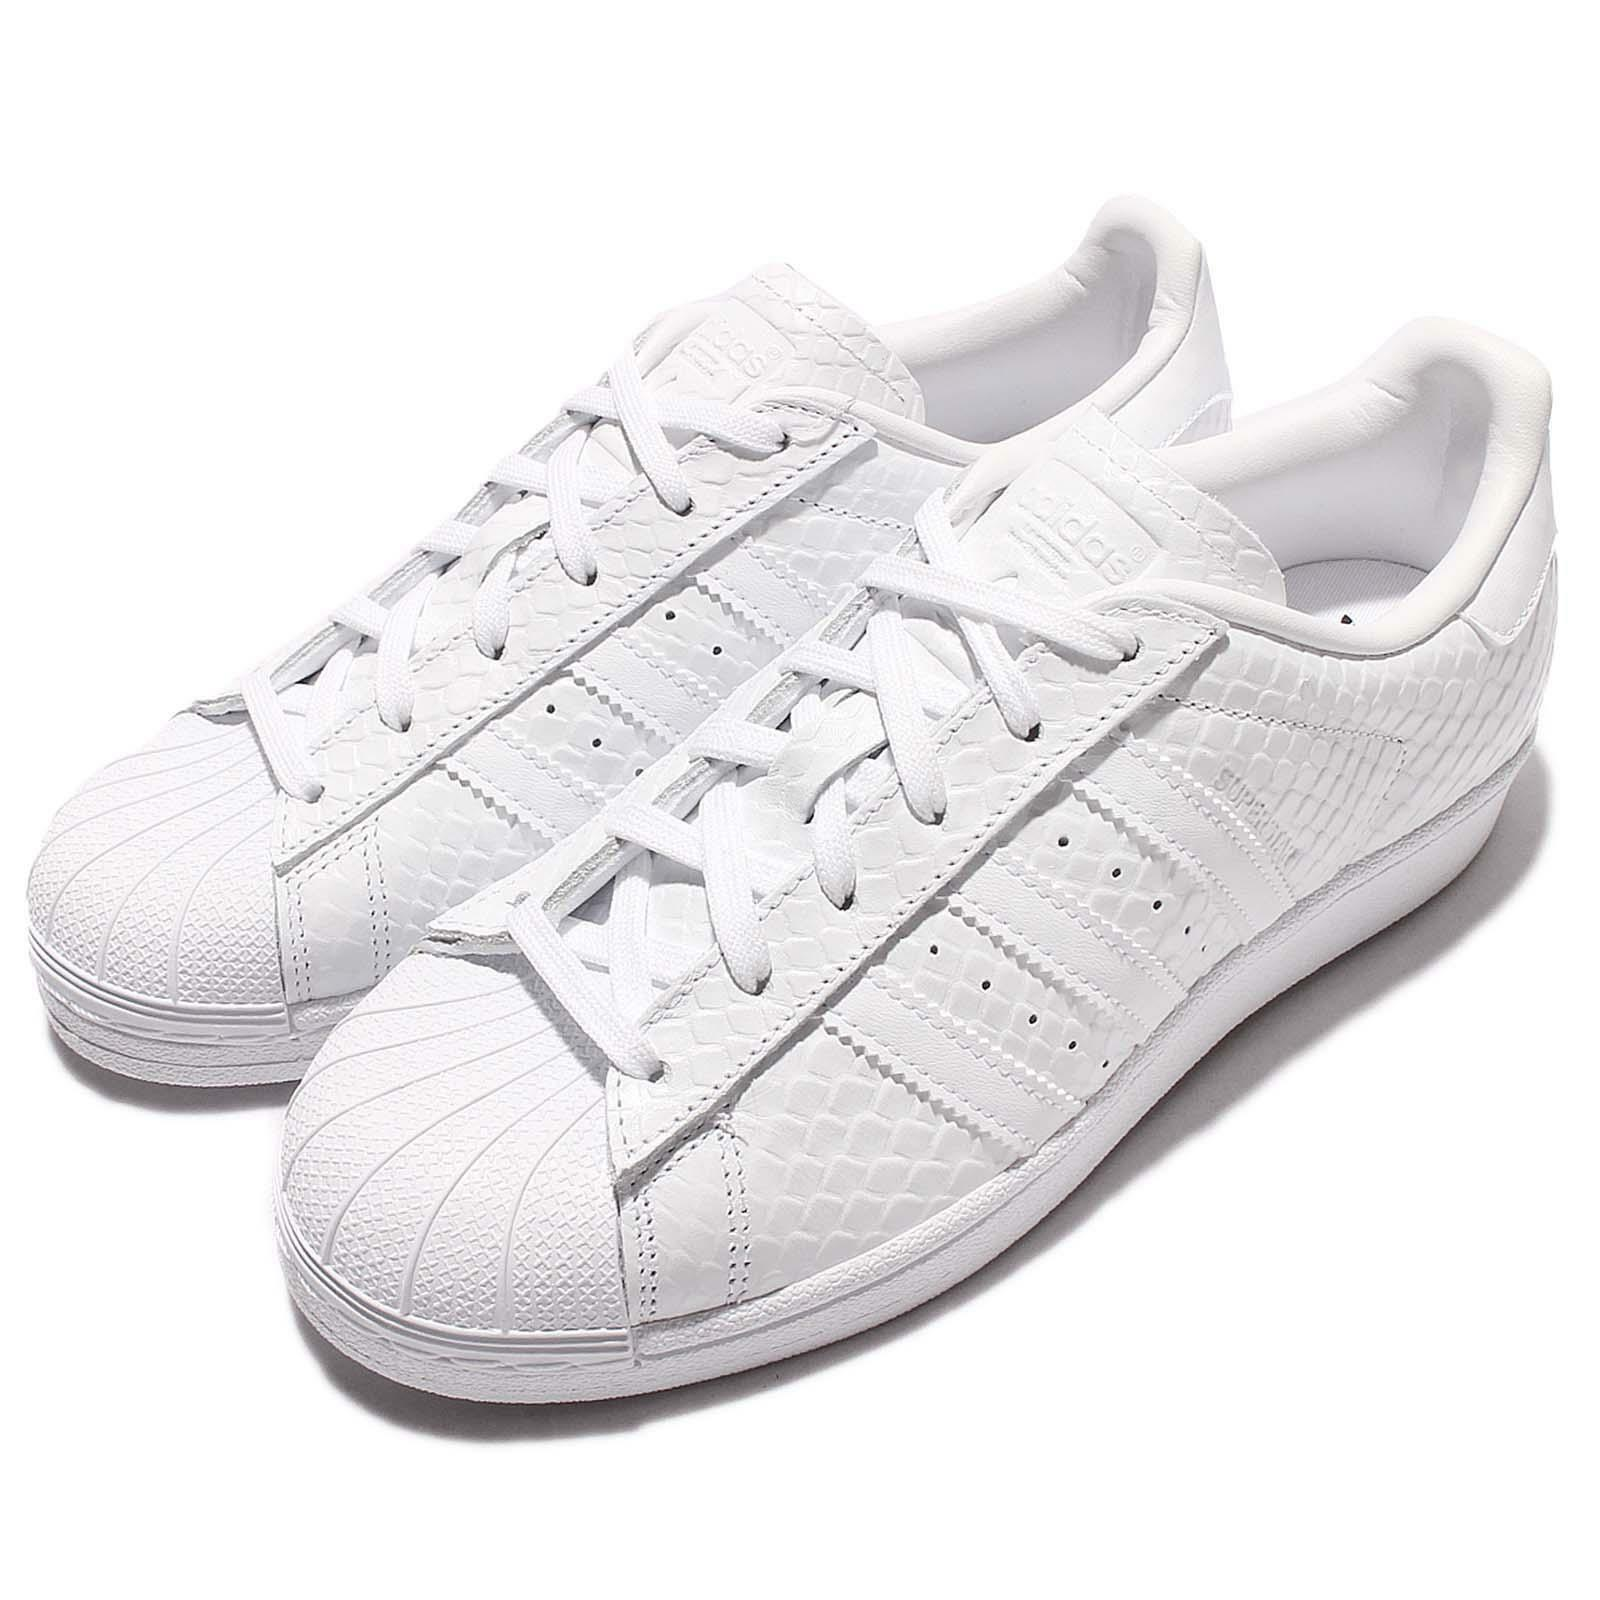 best service 03afe f41d8 NIB NIB NIB Adidas Originals Superstar W Women s Shoes White S76148 size  8.5 a3ad56